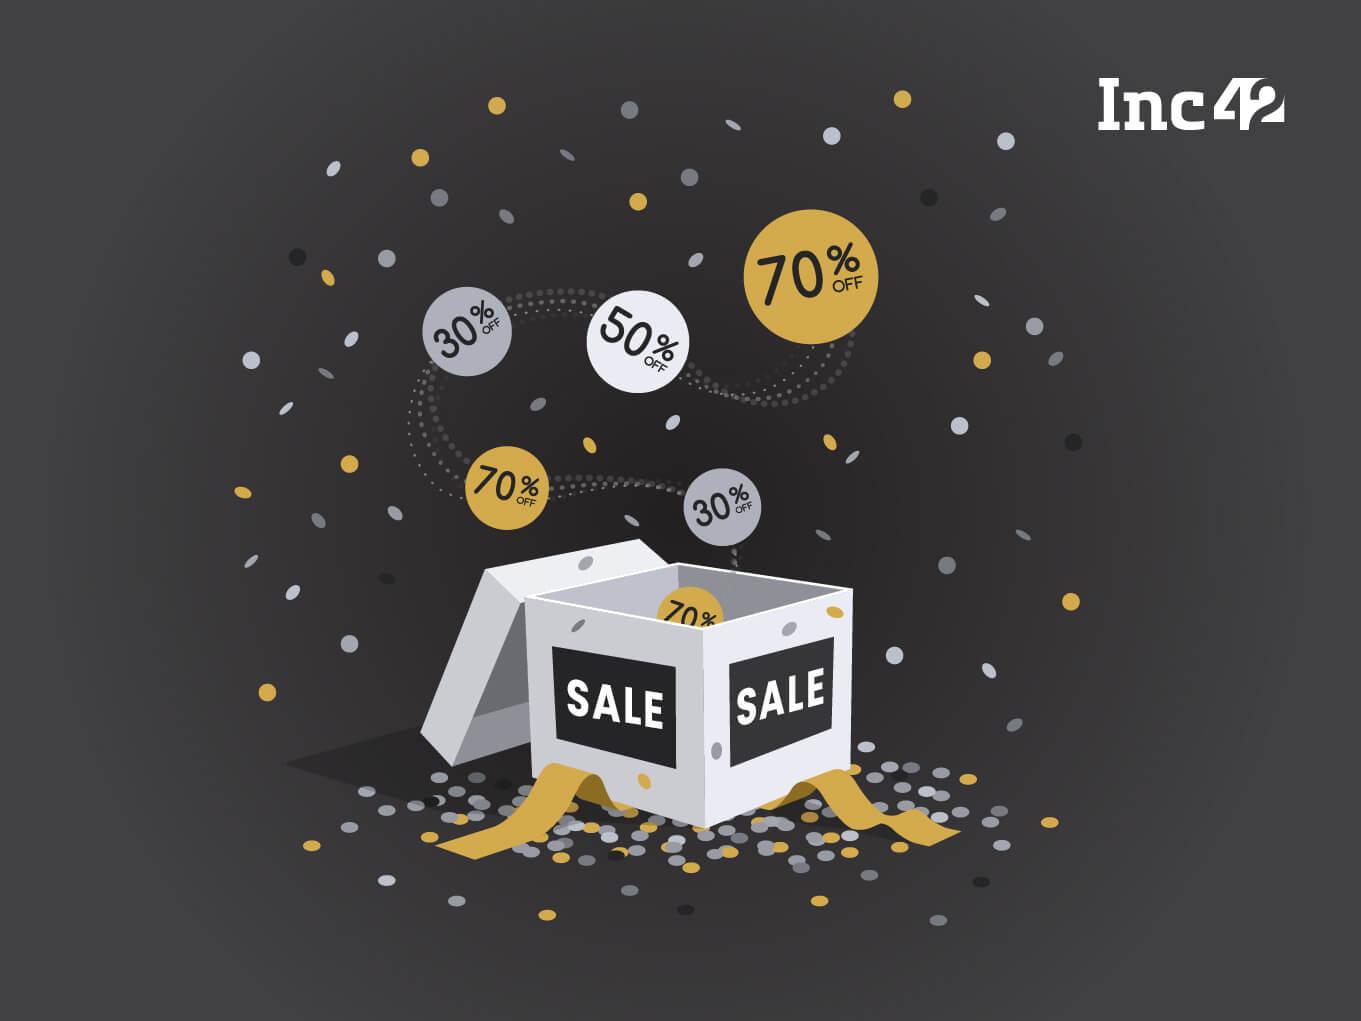 Festive Season Sales 2020: Which Ecommerce Marketplace Won The Customer Loyalty Race?